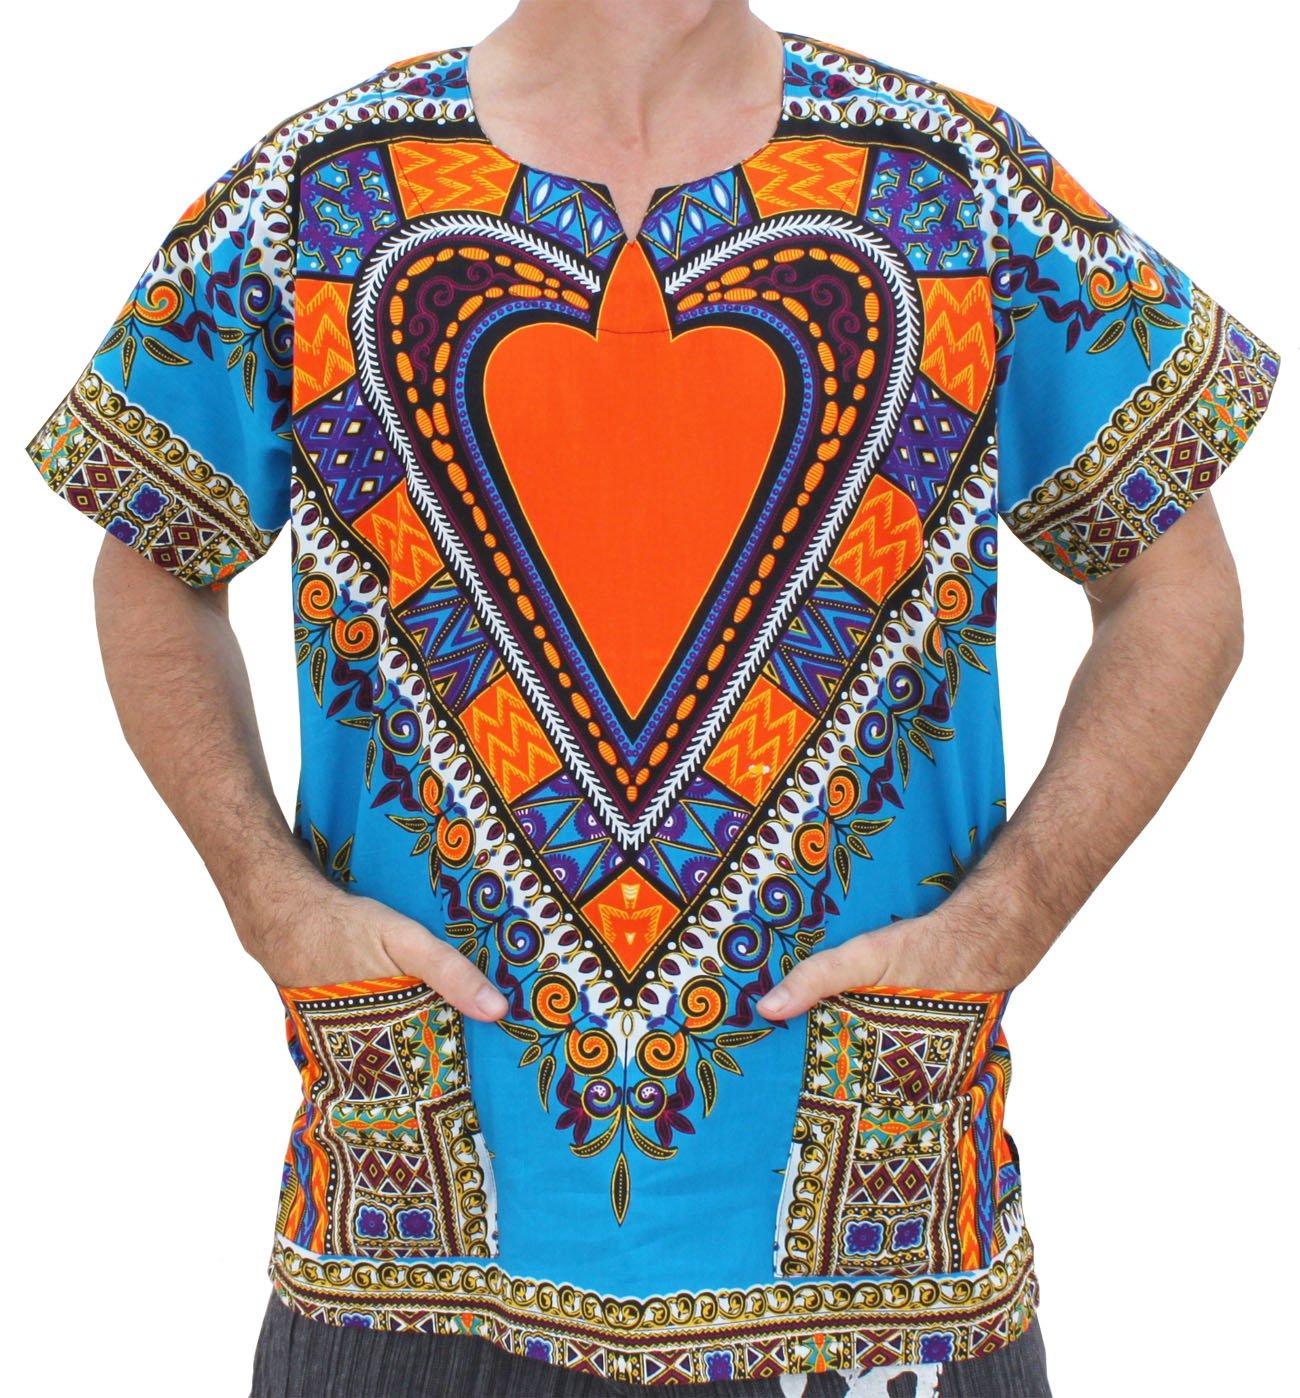 RaanPahMuang Unisex Bright Africa Heart Dashiki Cotton Plus Size Shirt, XXXXX-Large, Heart Blue